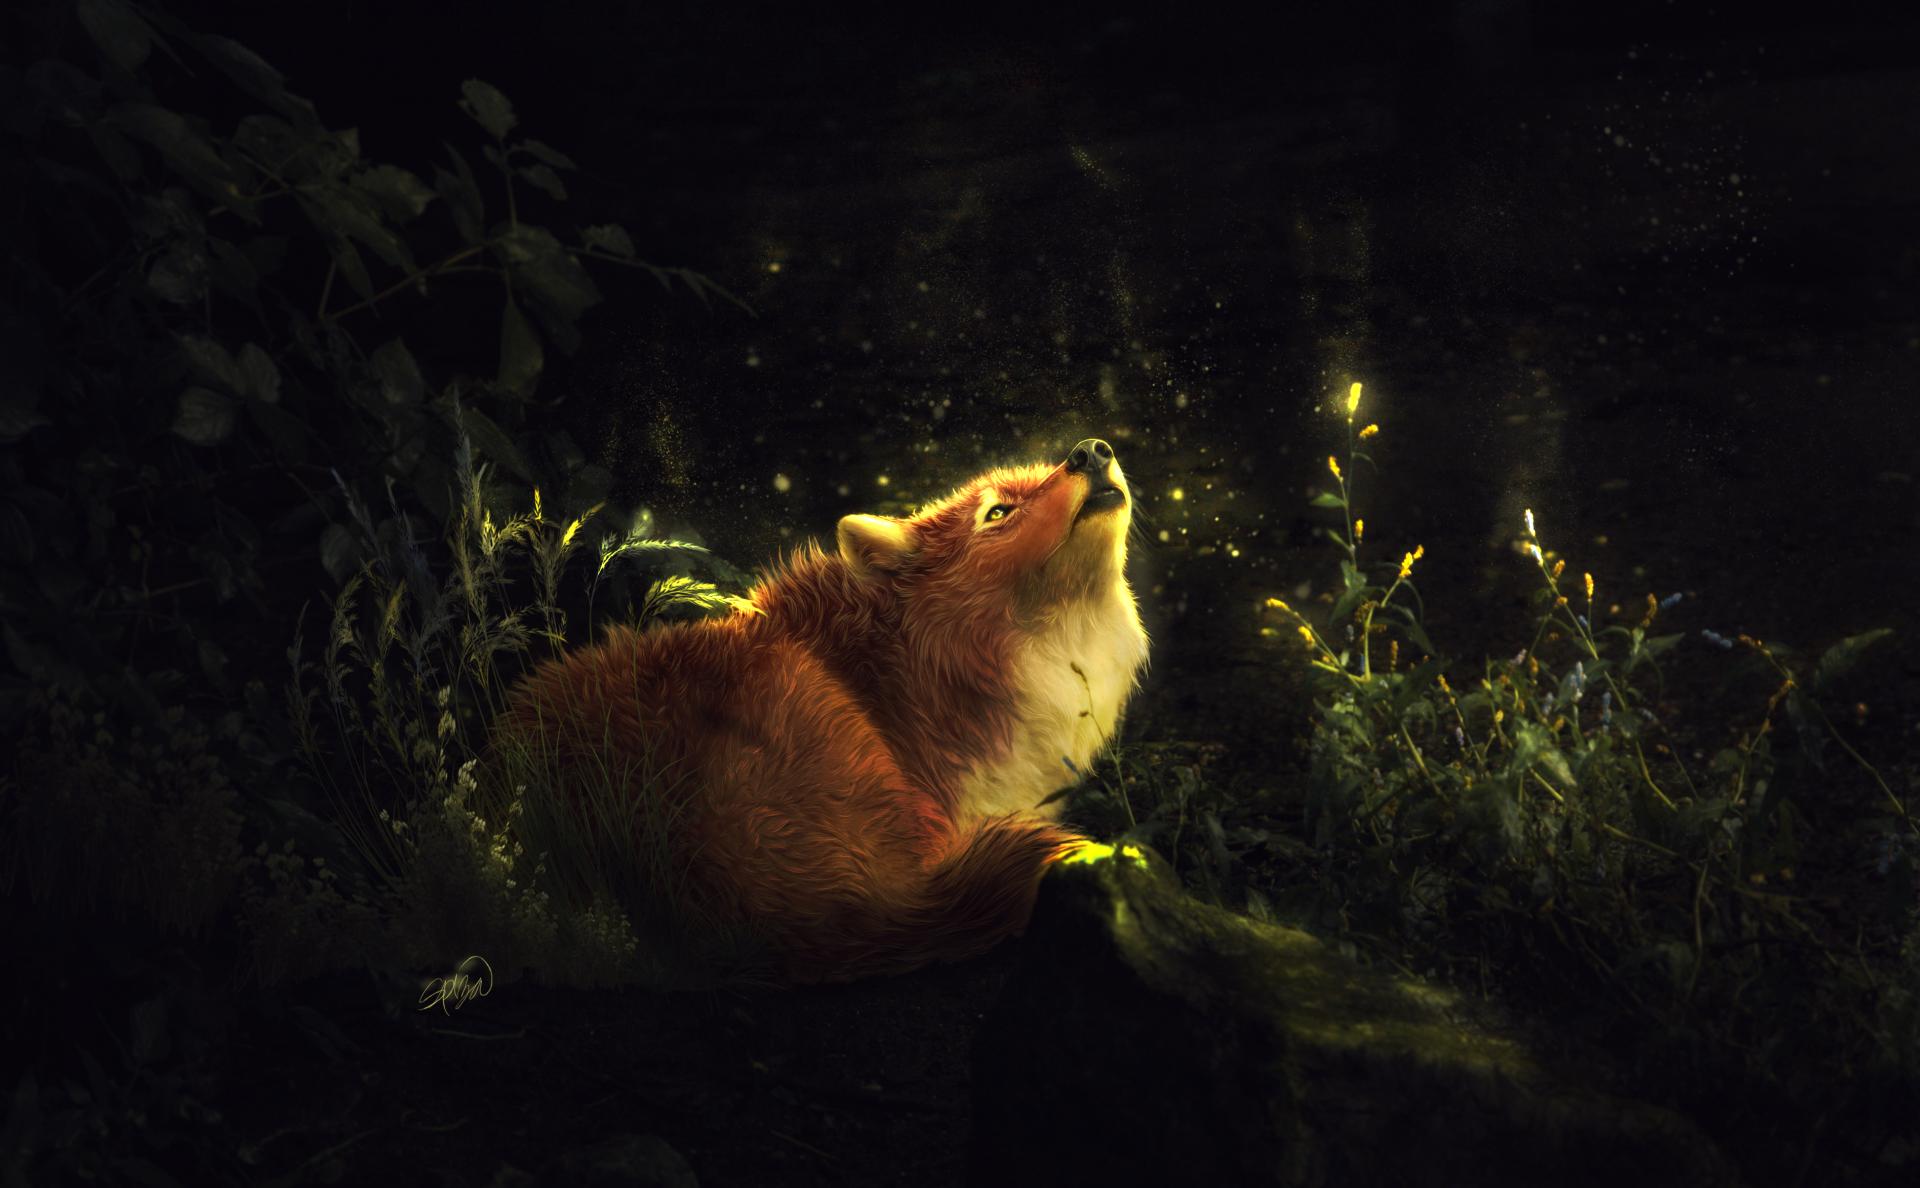 Fantasy - Fox  Artistic Animal Forest Light Firefly Wallpaper